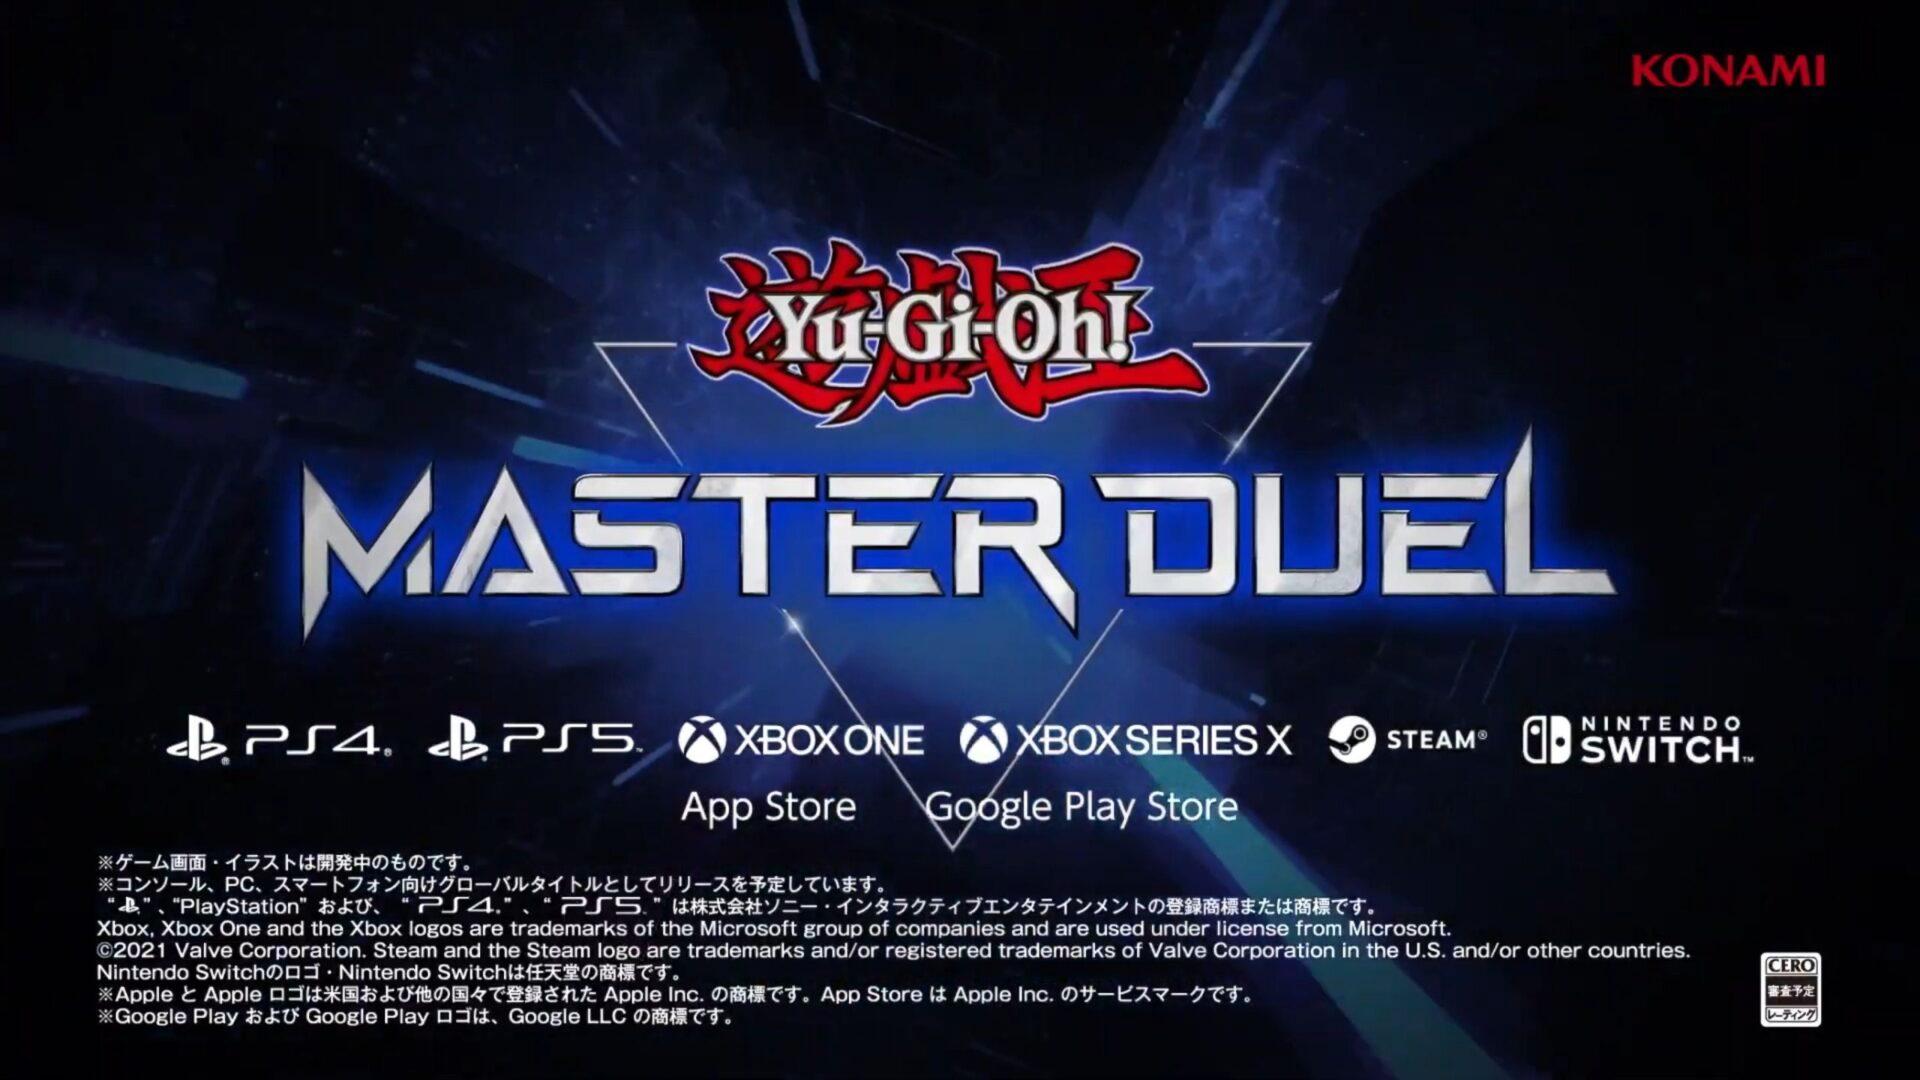 Yu Gi Oh Master Duel